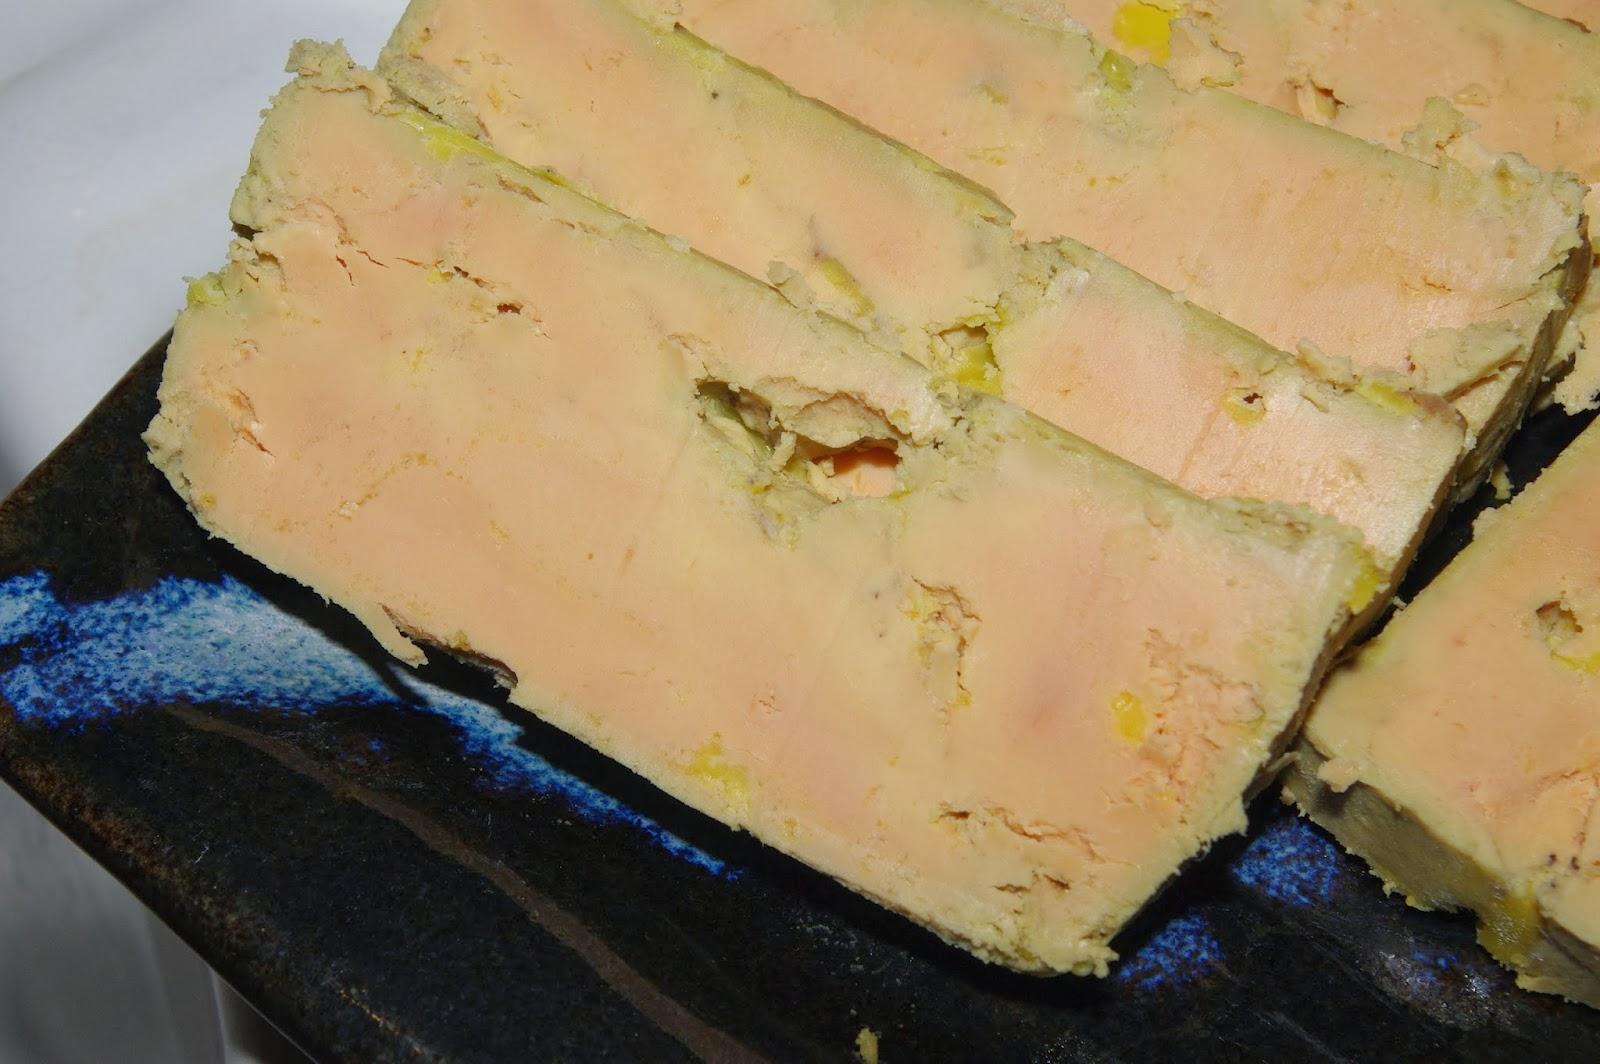 Saveurs cr ation foie gras maison marin au macvin du jura - Cuisiner un foie gras cru ...